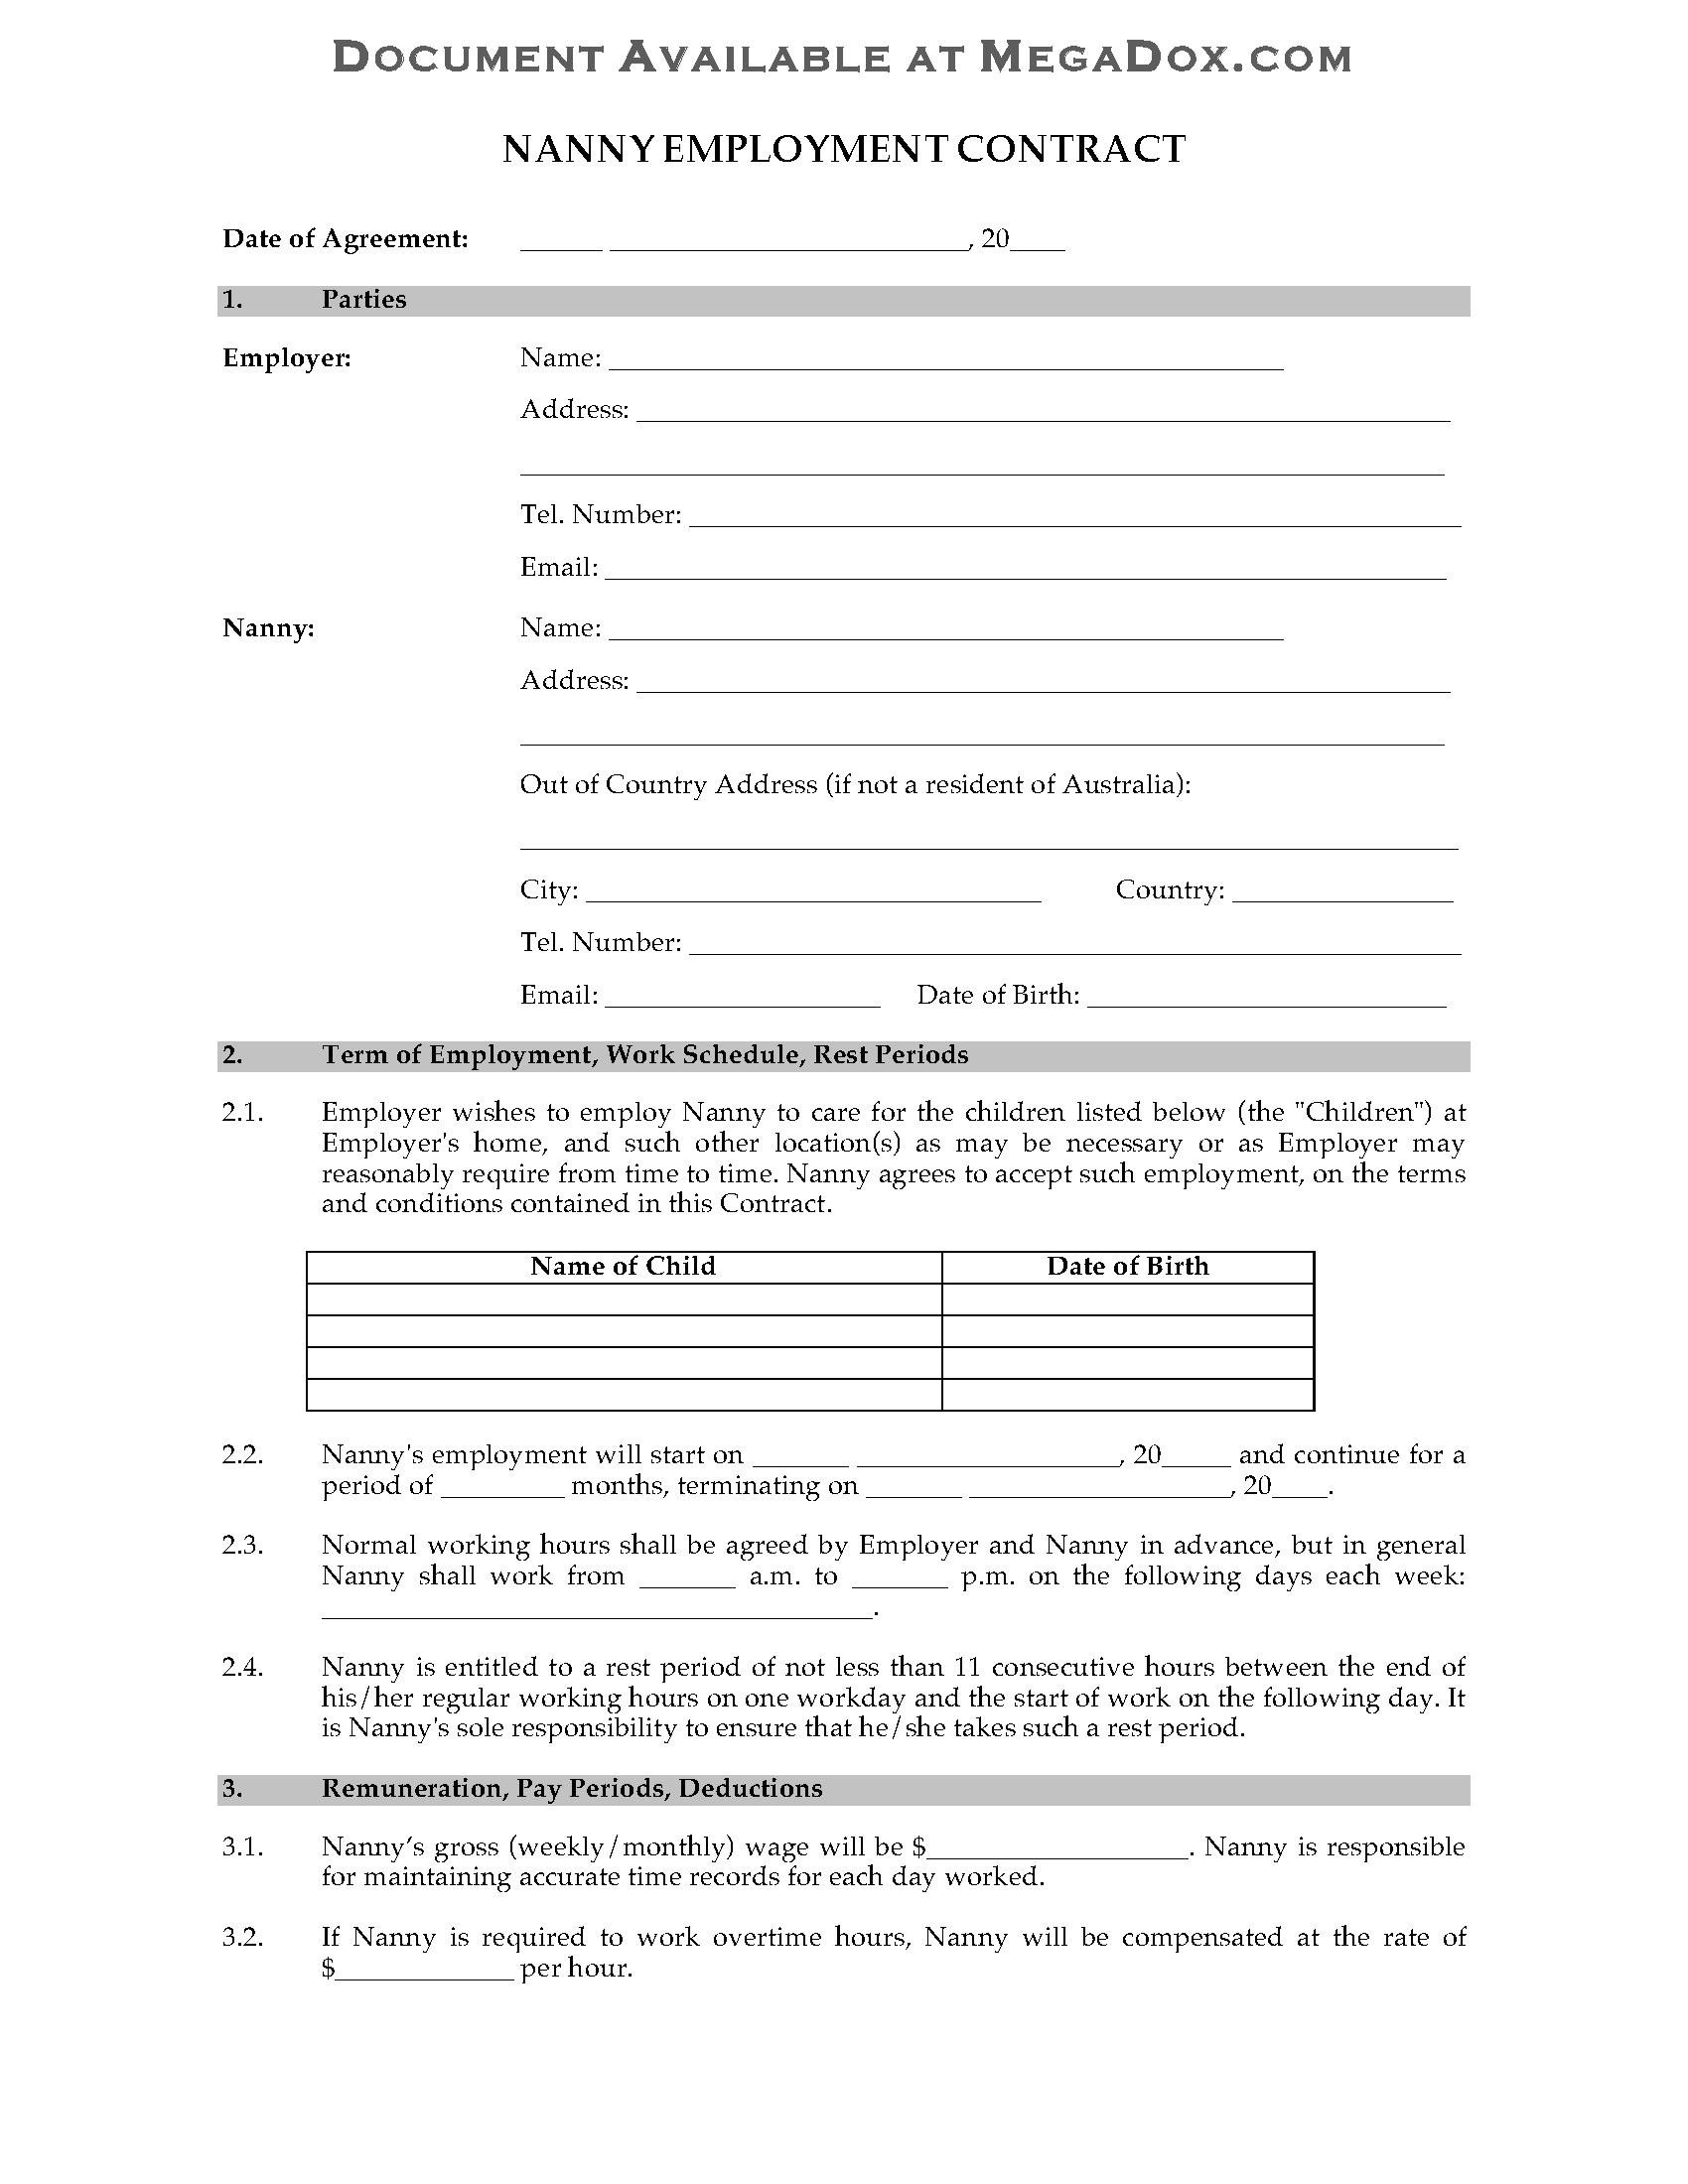 australia nanny employment contract